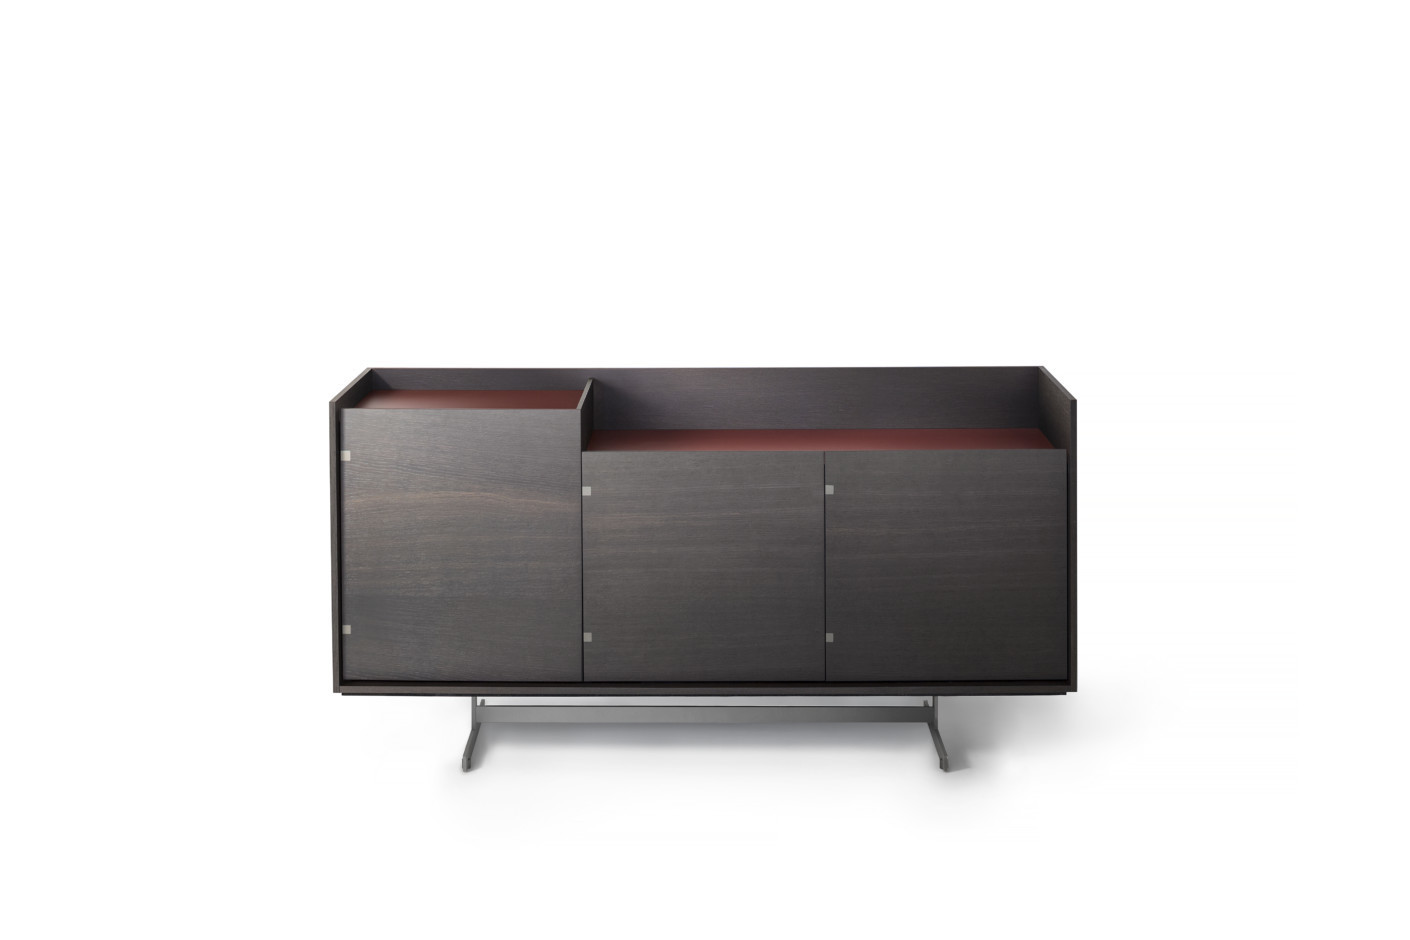 Lema_Cases_design-Francesco-Rota-04_170331_144613.jpeg